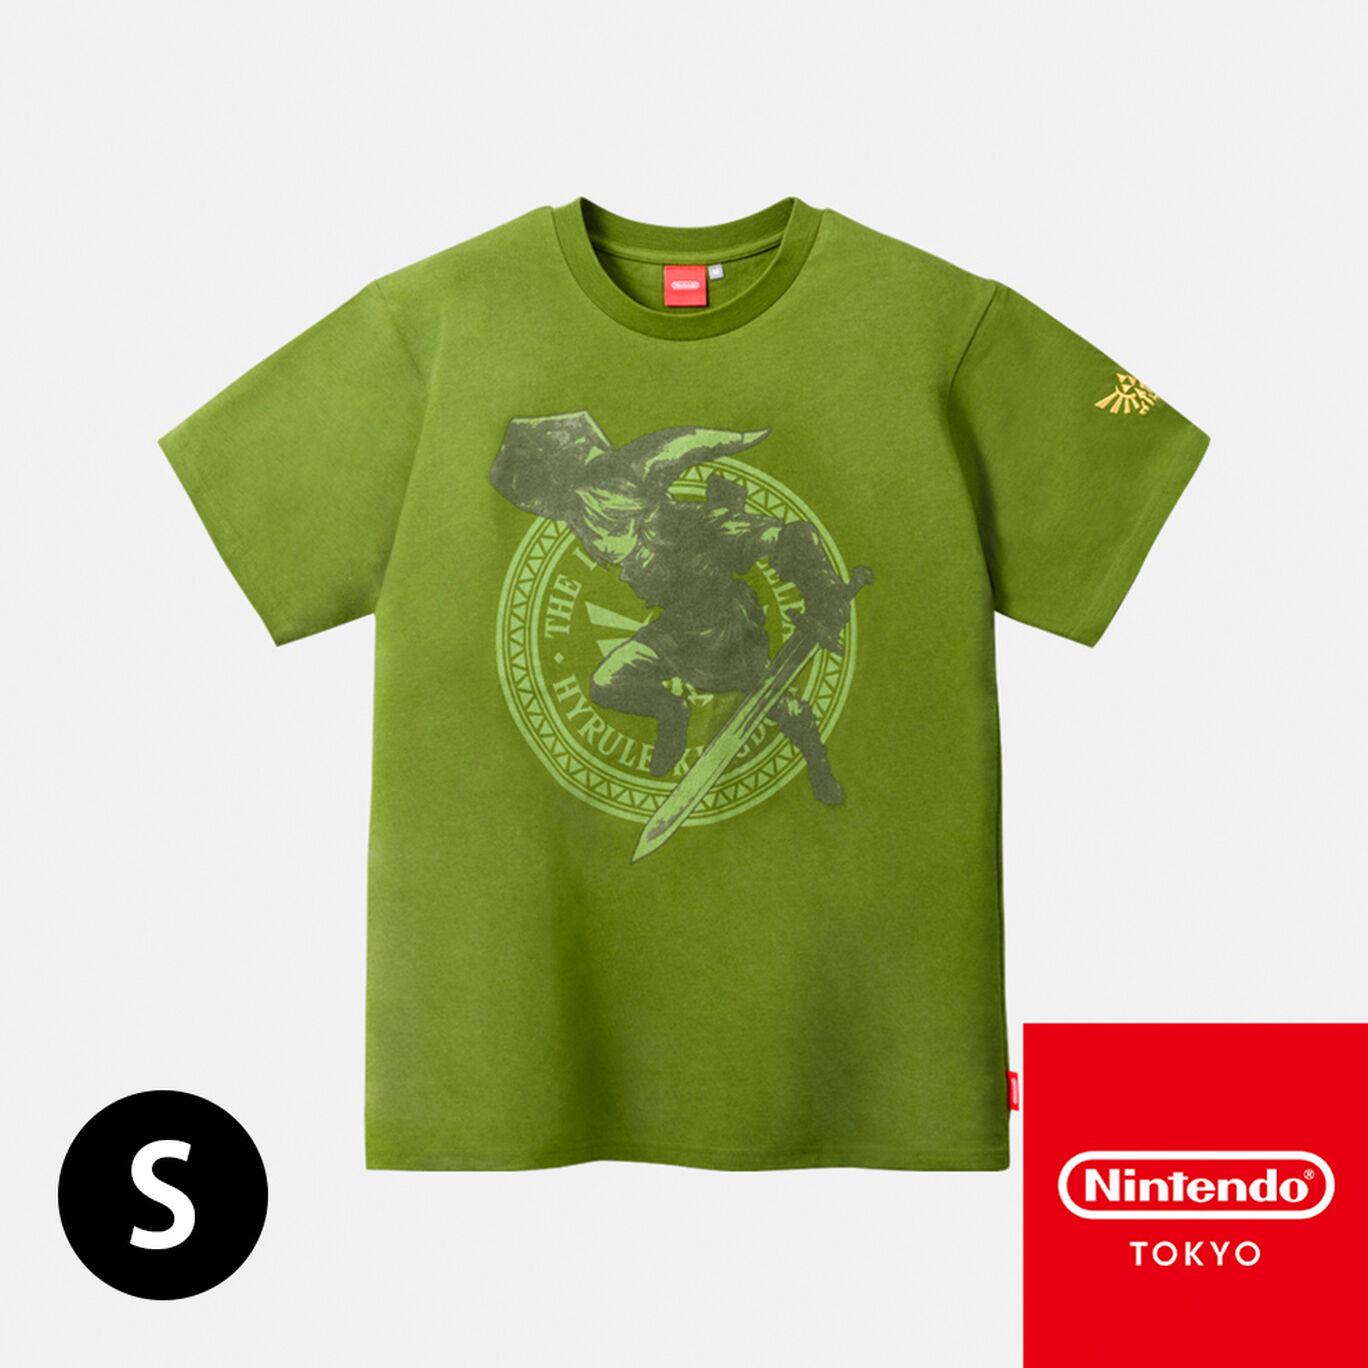 Tシャツ ゼルダの伝説 A S【Nintendo TOKYO取り扱い商品】